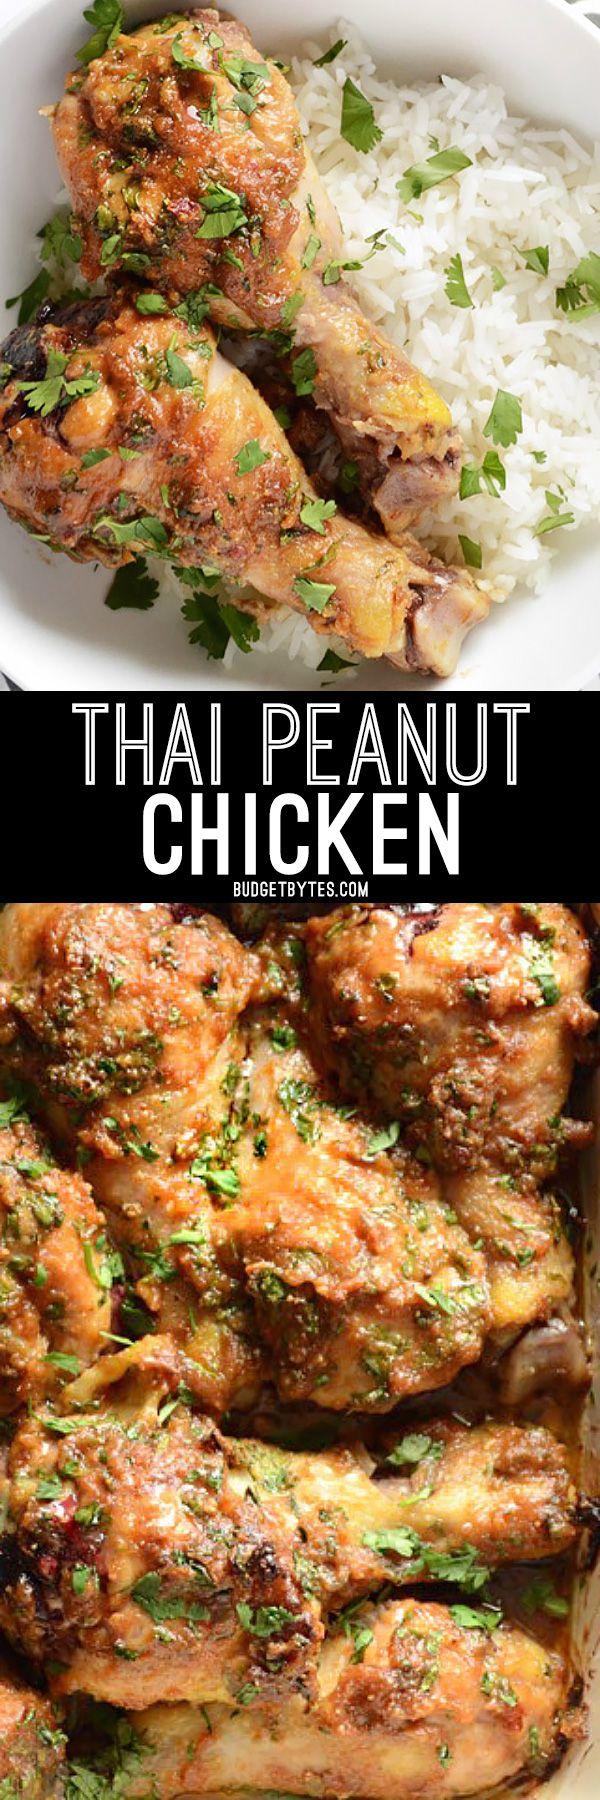 154 best Internat\'l(Chicken) images on Pinterest | Cooking food ...